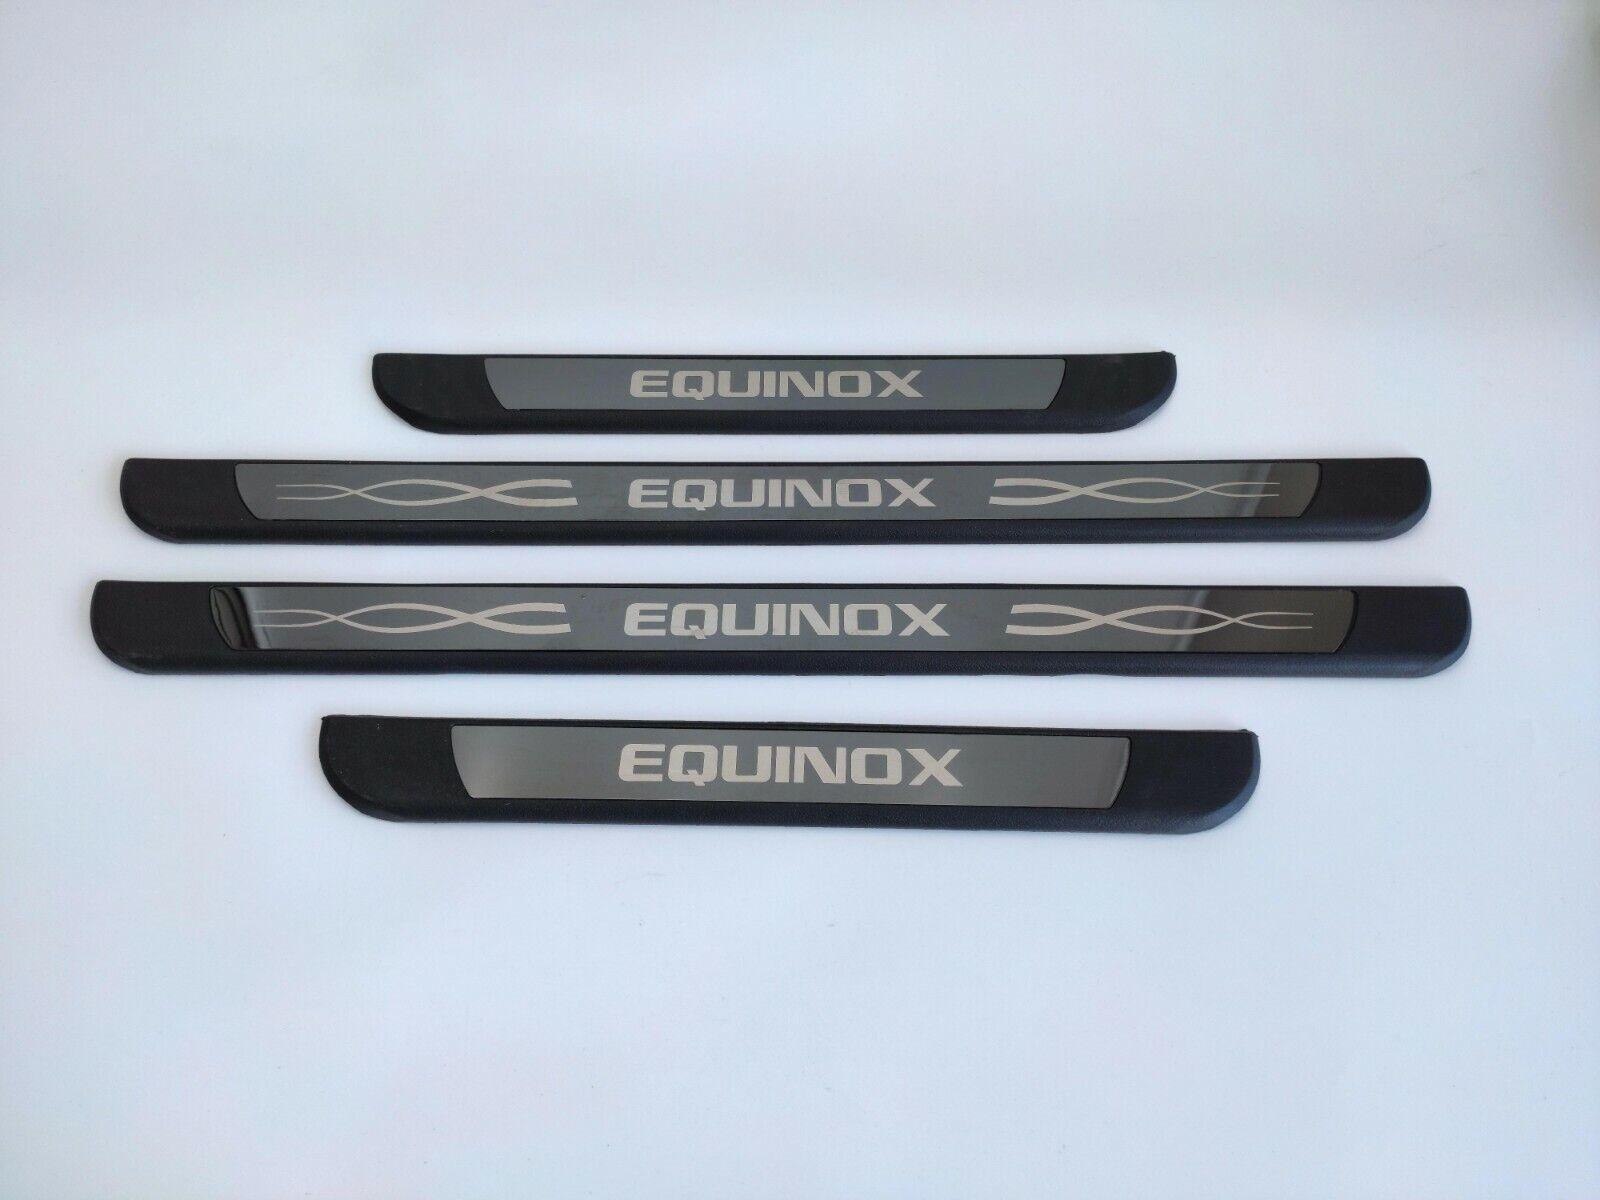 Car Parts - Parts For Chevrolet Equinox 2020 Accessories Car Door Sill Protector Scuff Plate